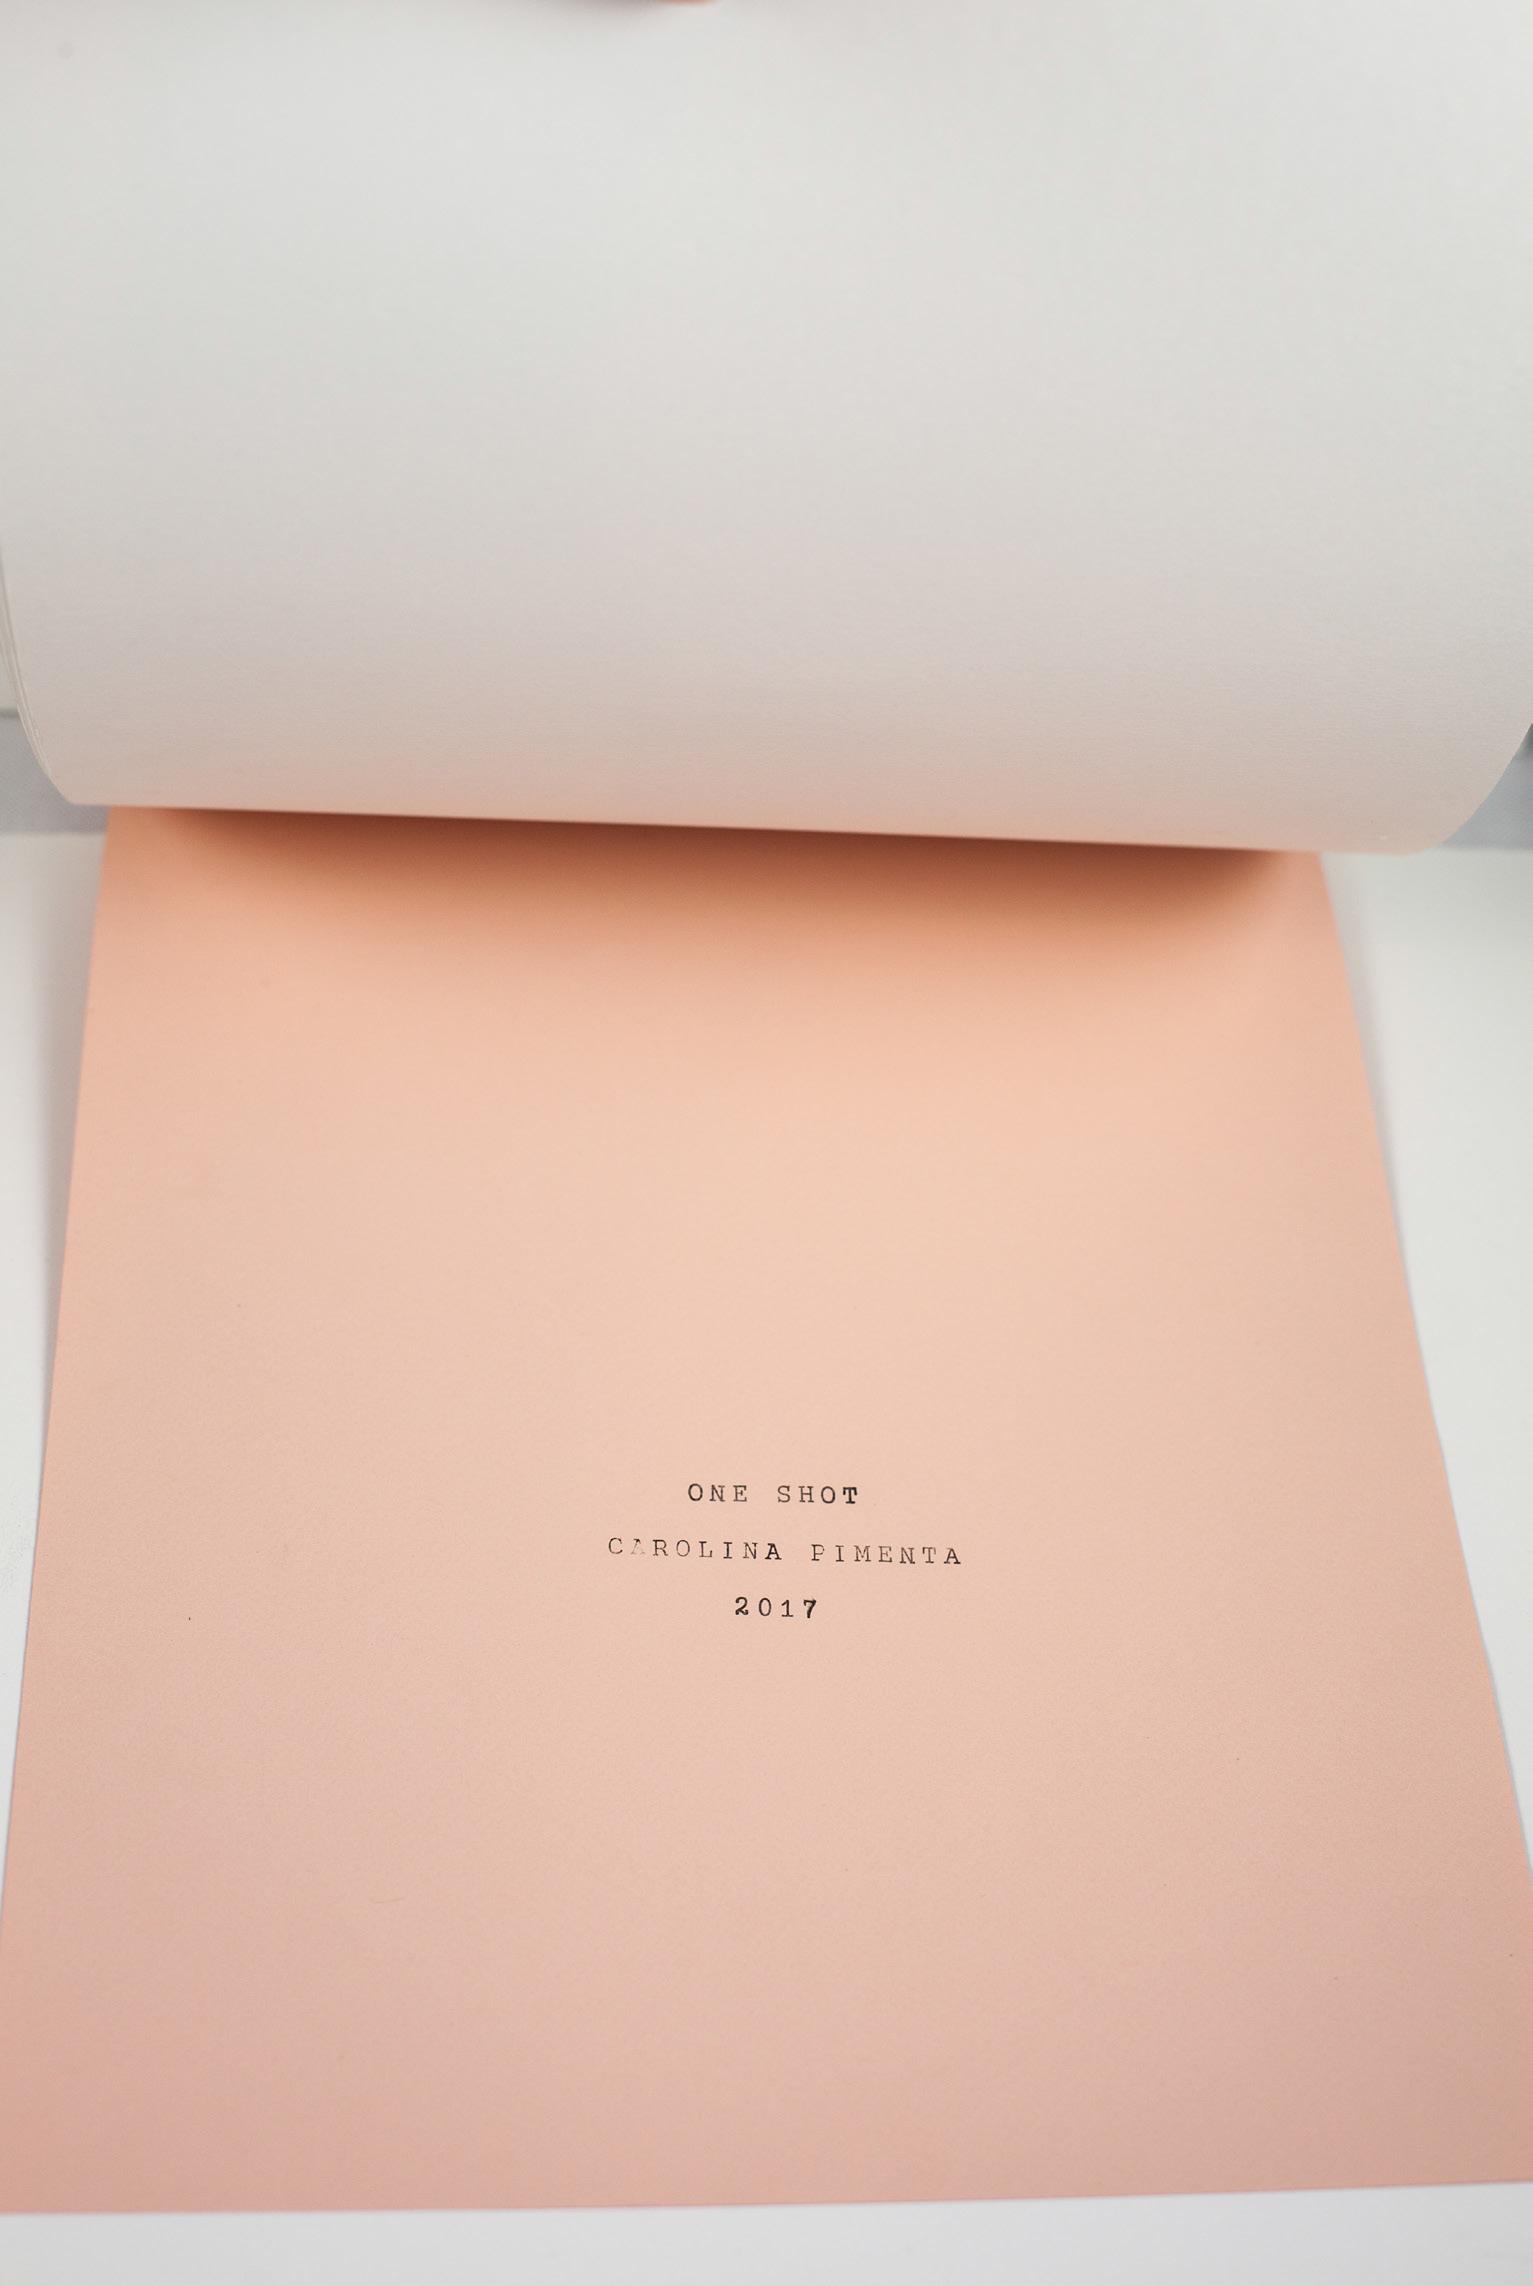 Carolina-Pimenta-One-Shot-Artist-book_027.jpg